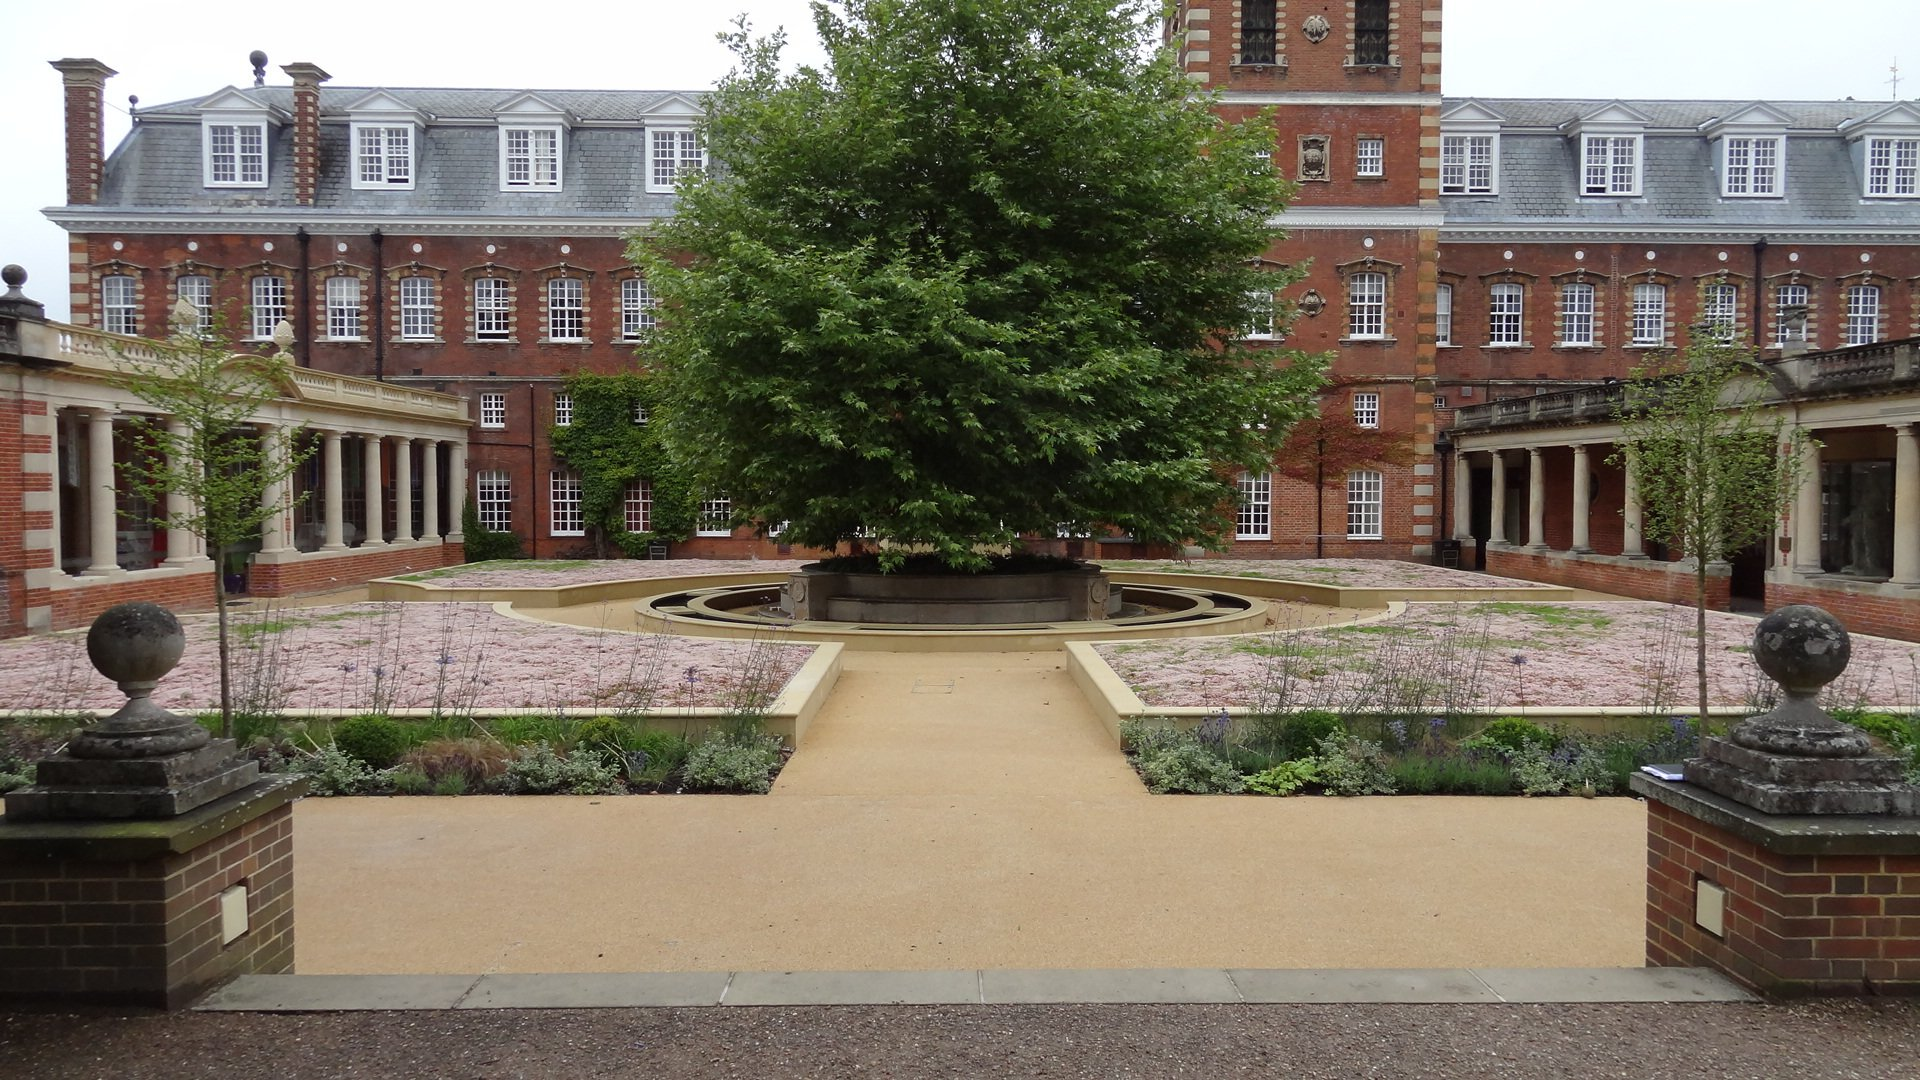 resin bound walkway in formal garden setting